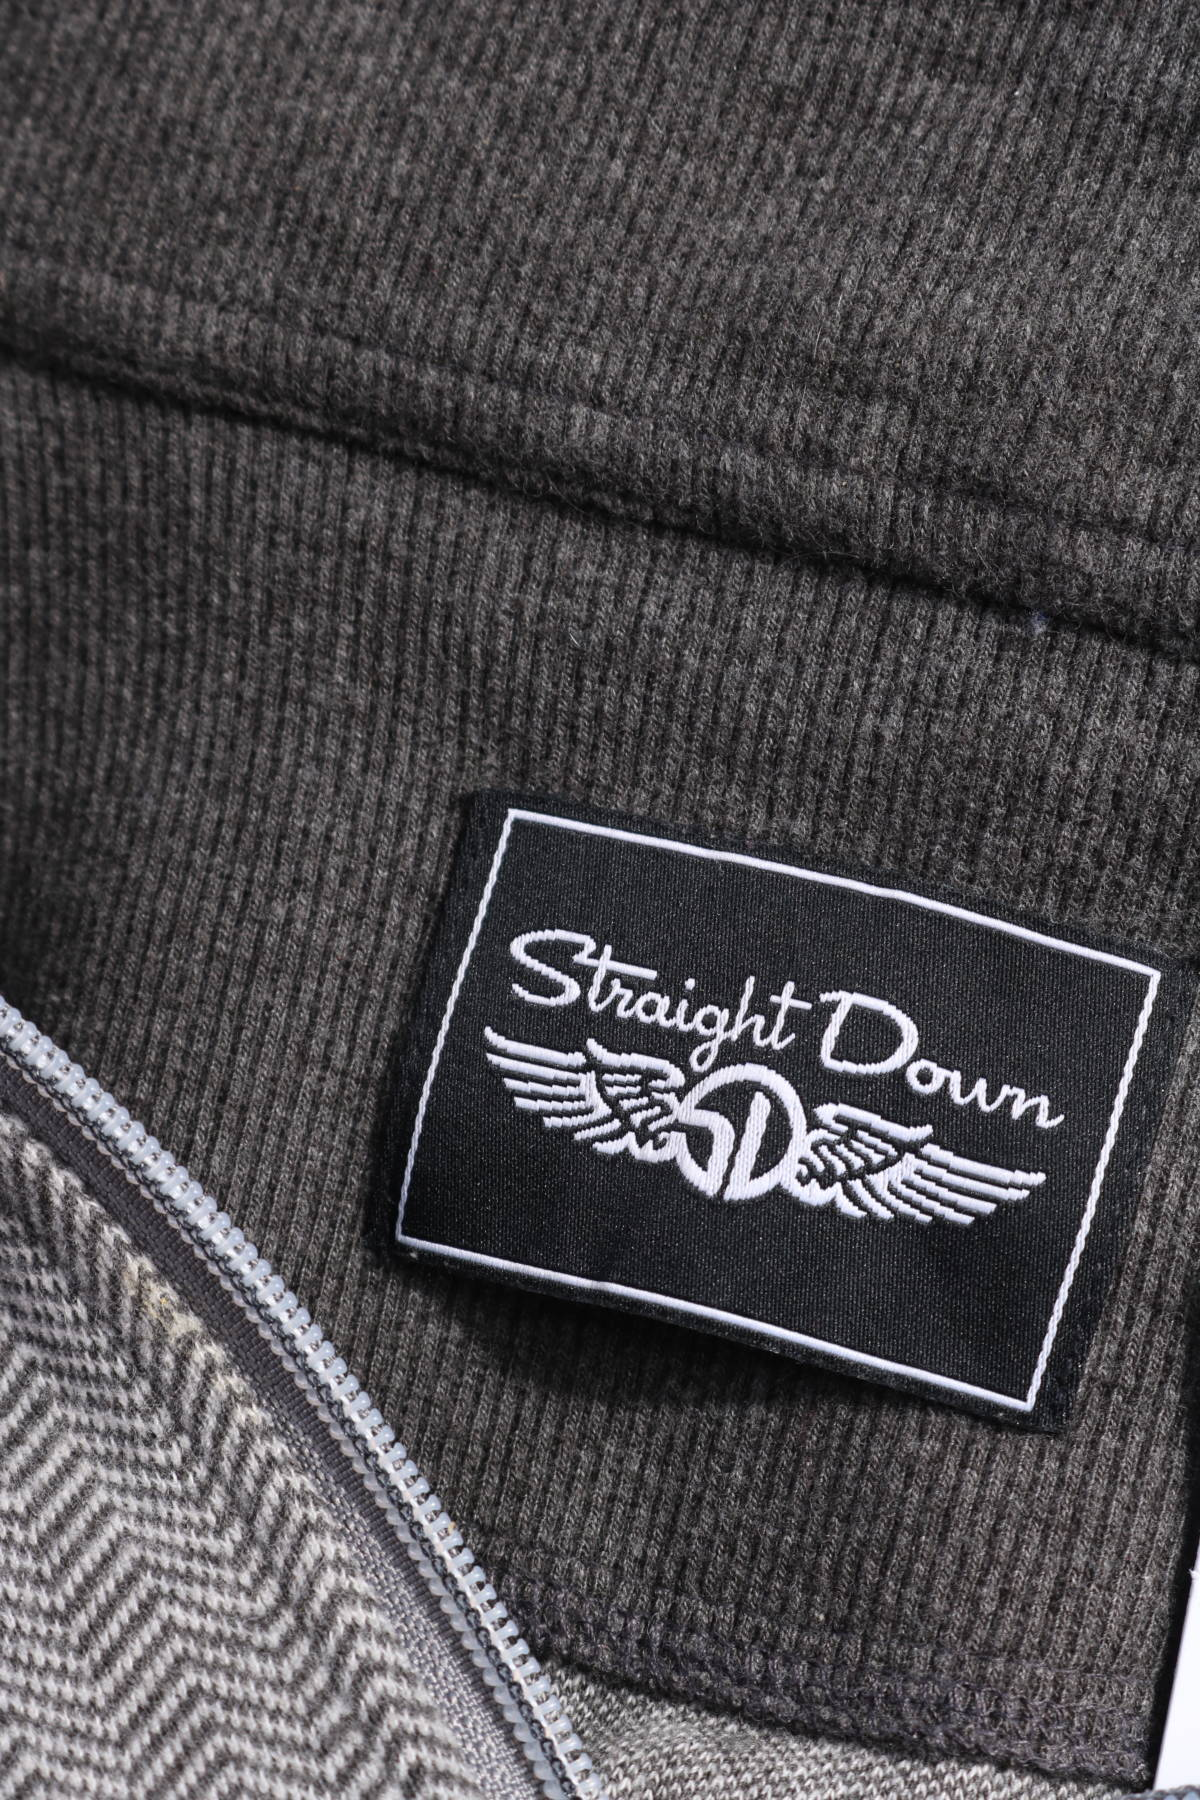 Пуловер с поло яка STRAIGHT DOWN3